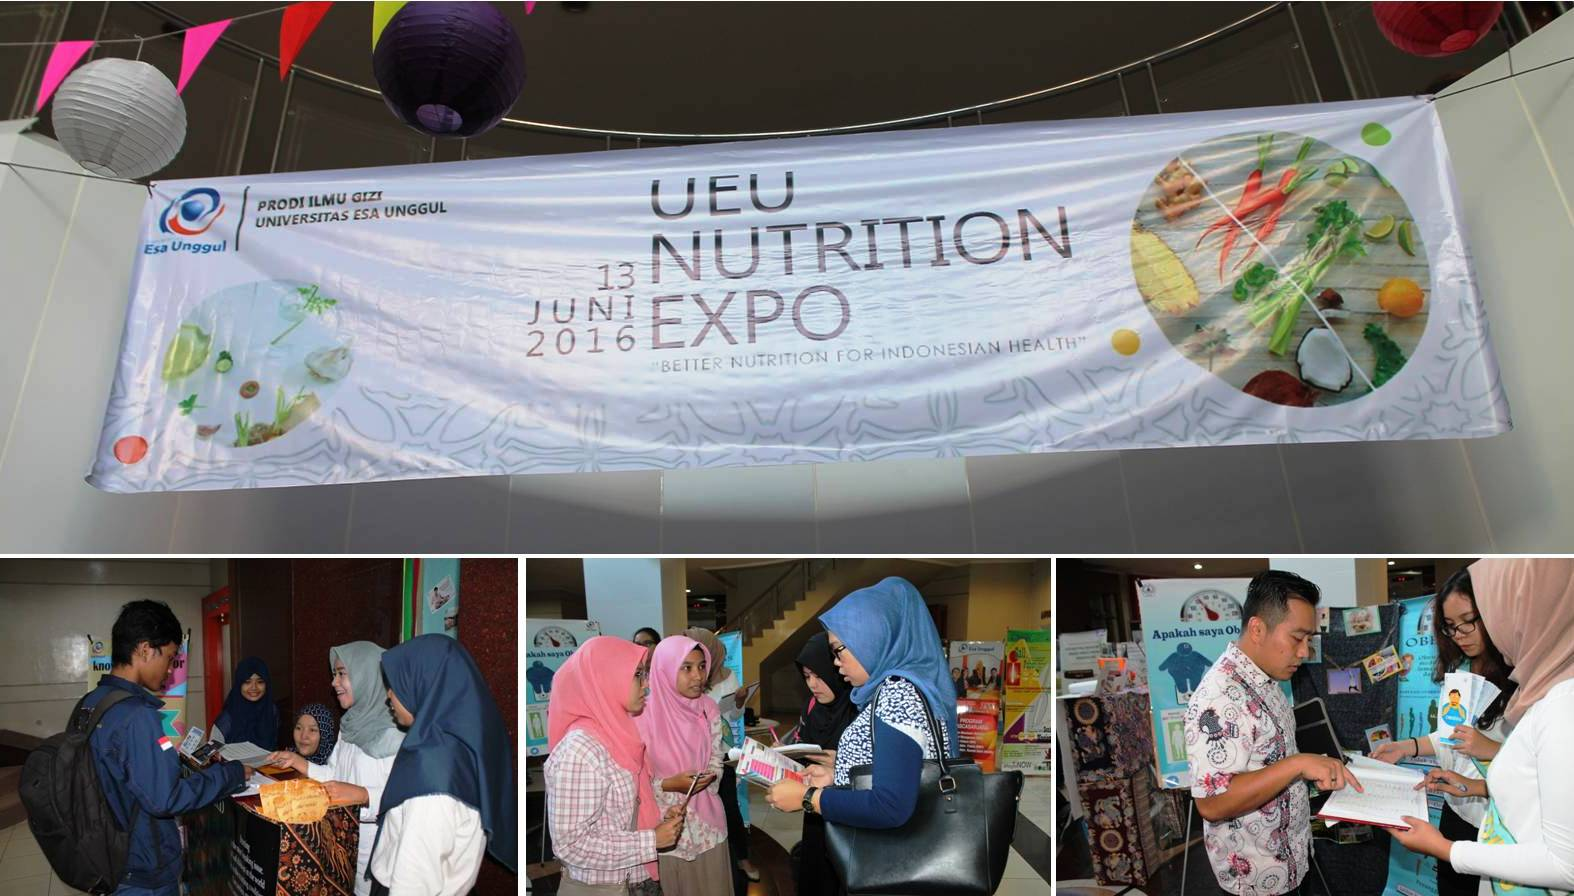 Hari Pertama Nutrition Expo Universitas Esa Unggul